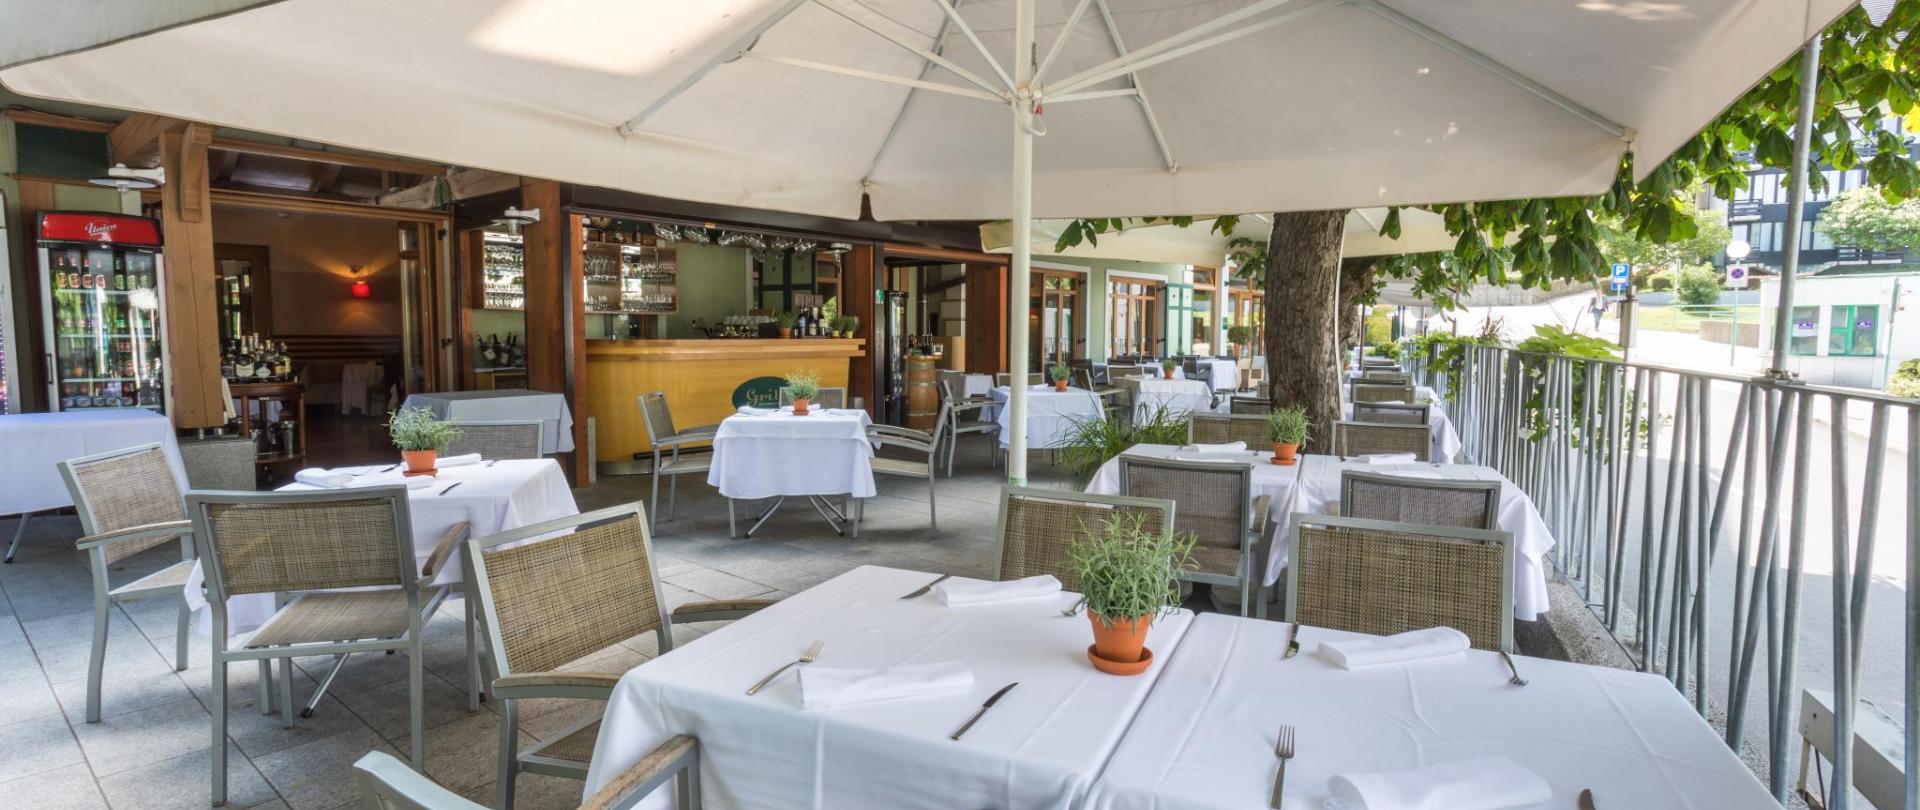 Hotel Lovec - Grill Lovec Restaurant Terrasse